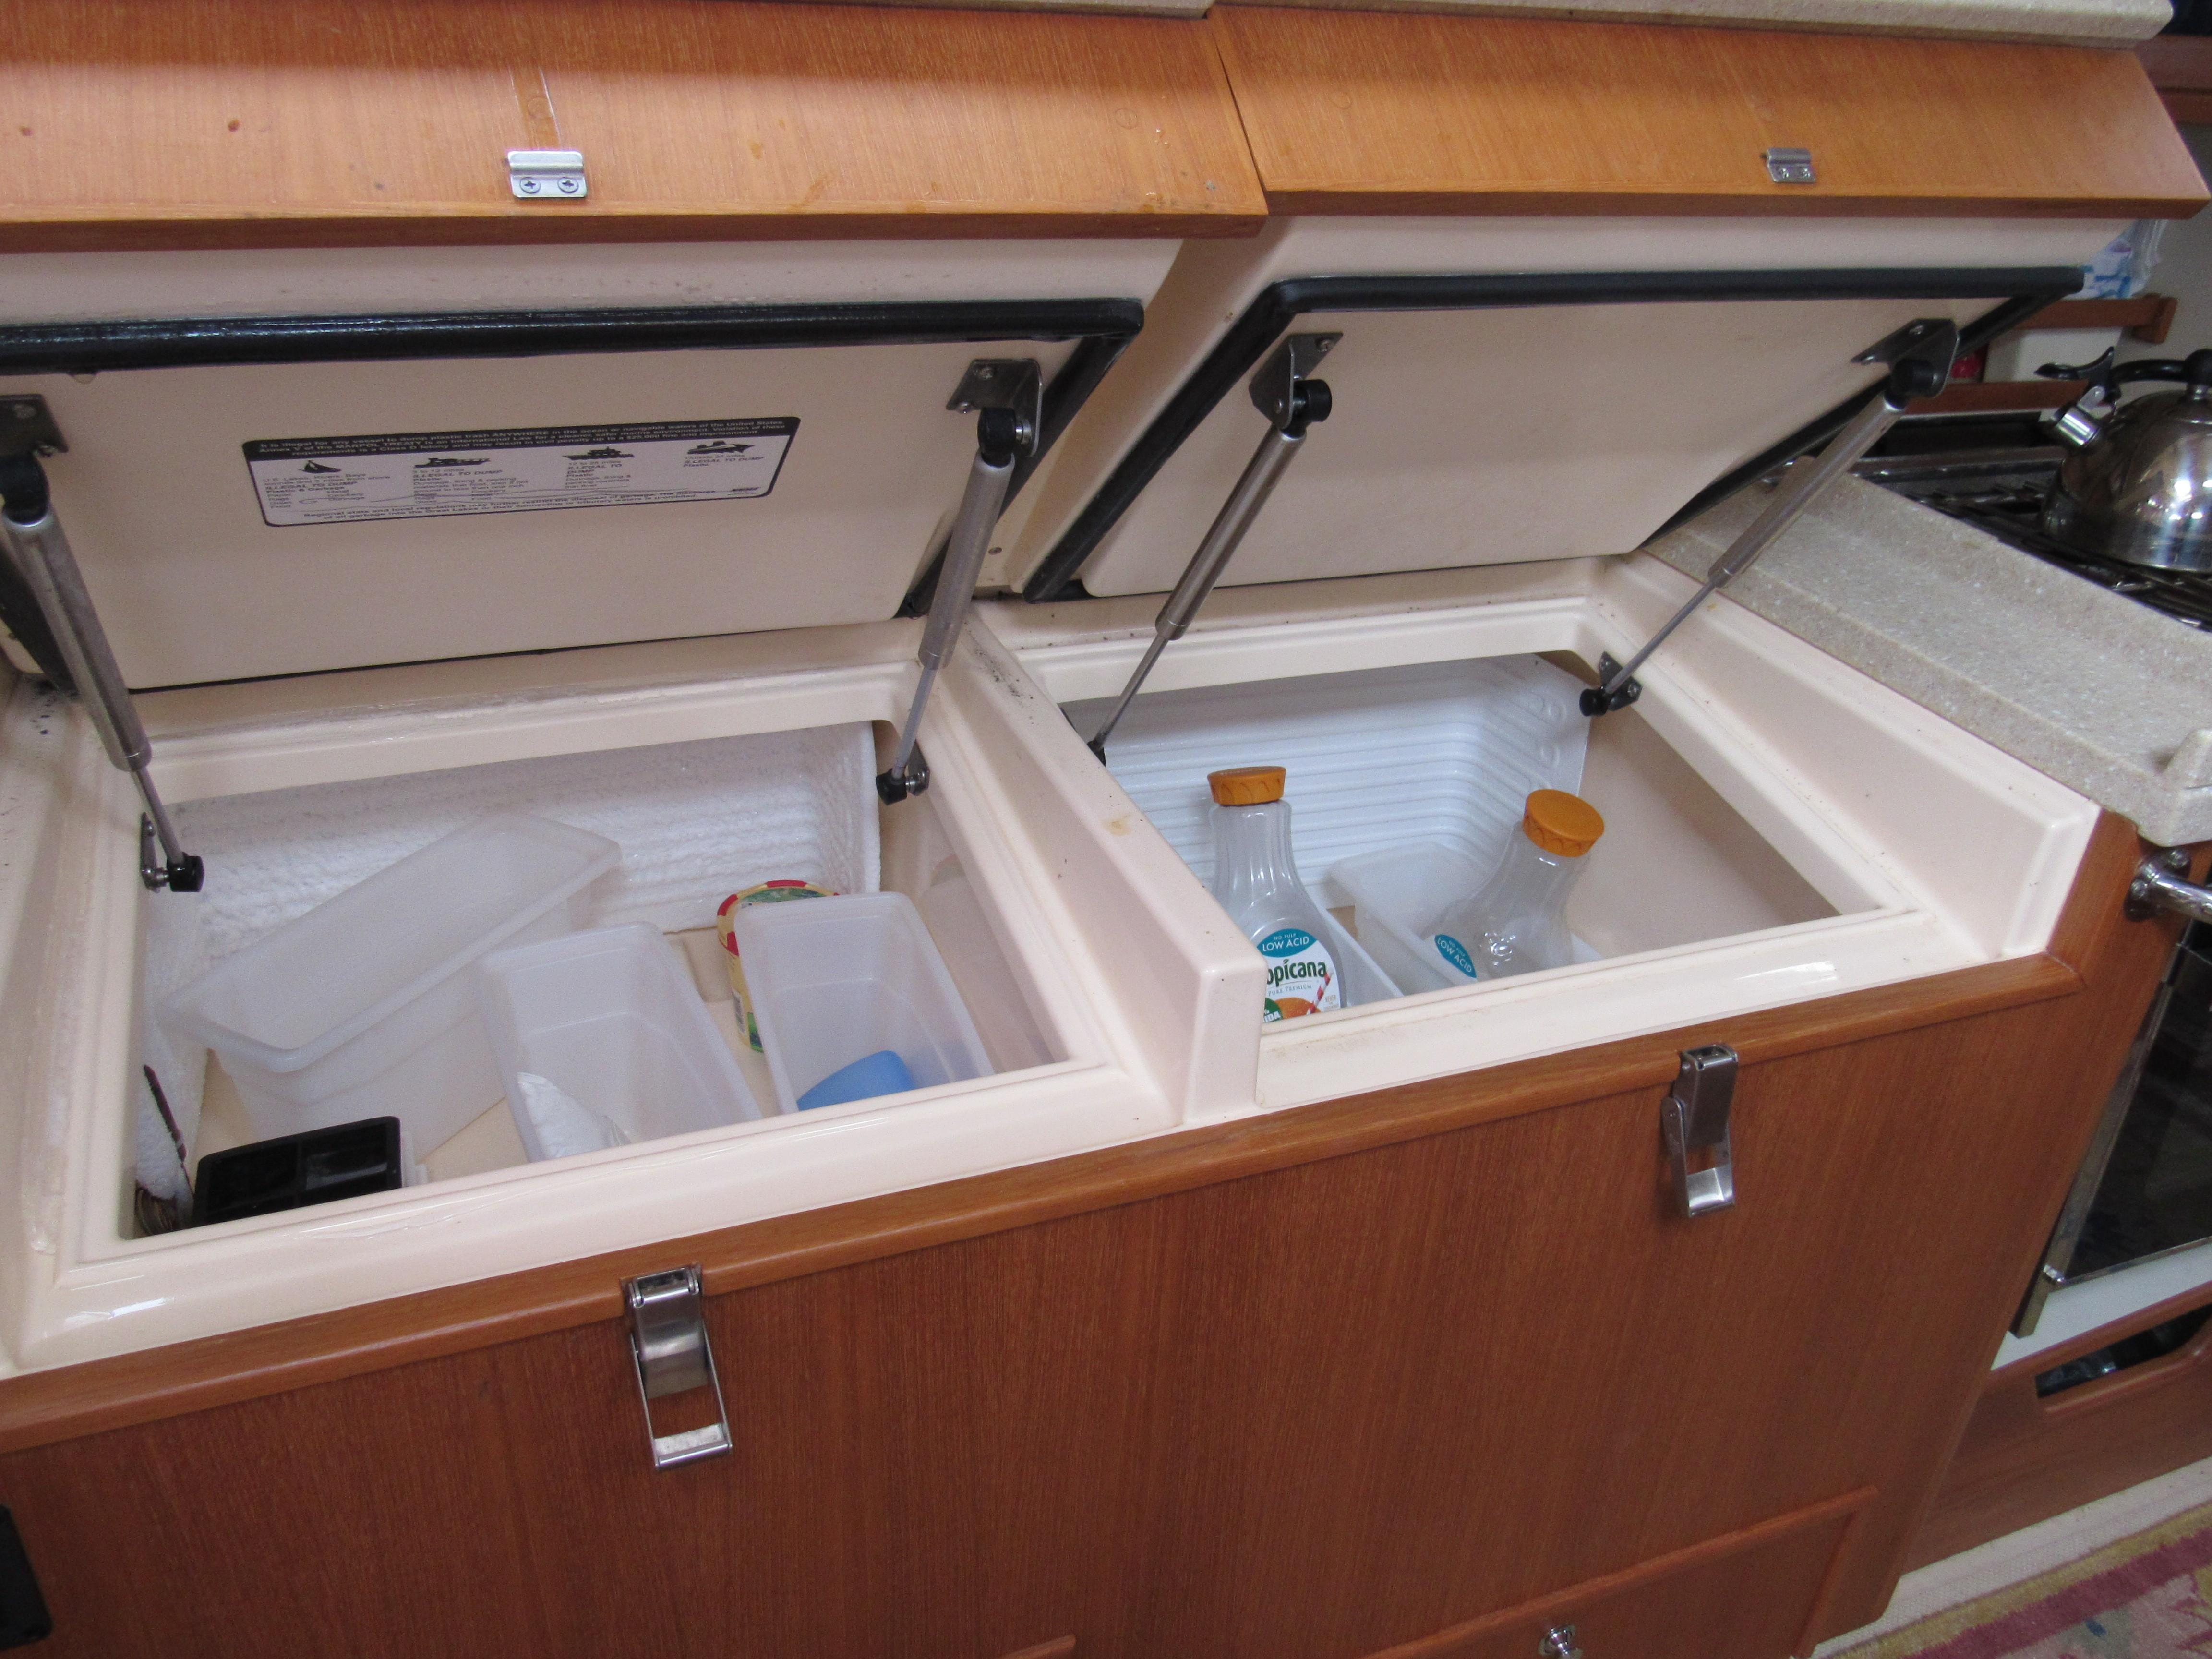 Refrigeration and freezer